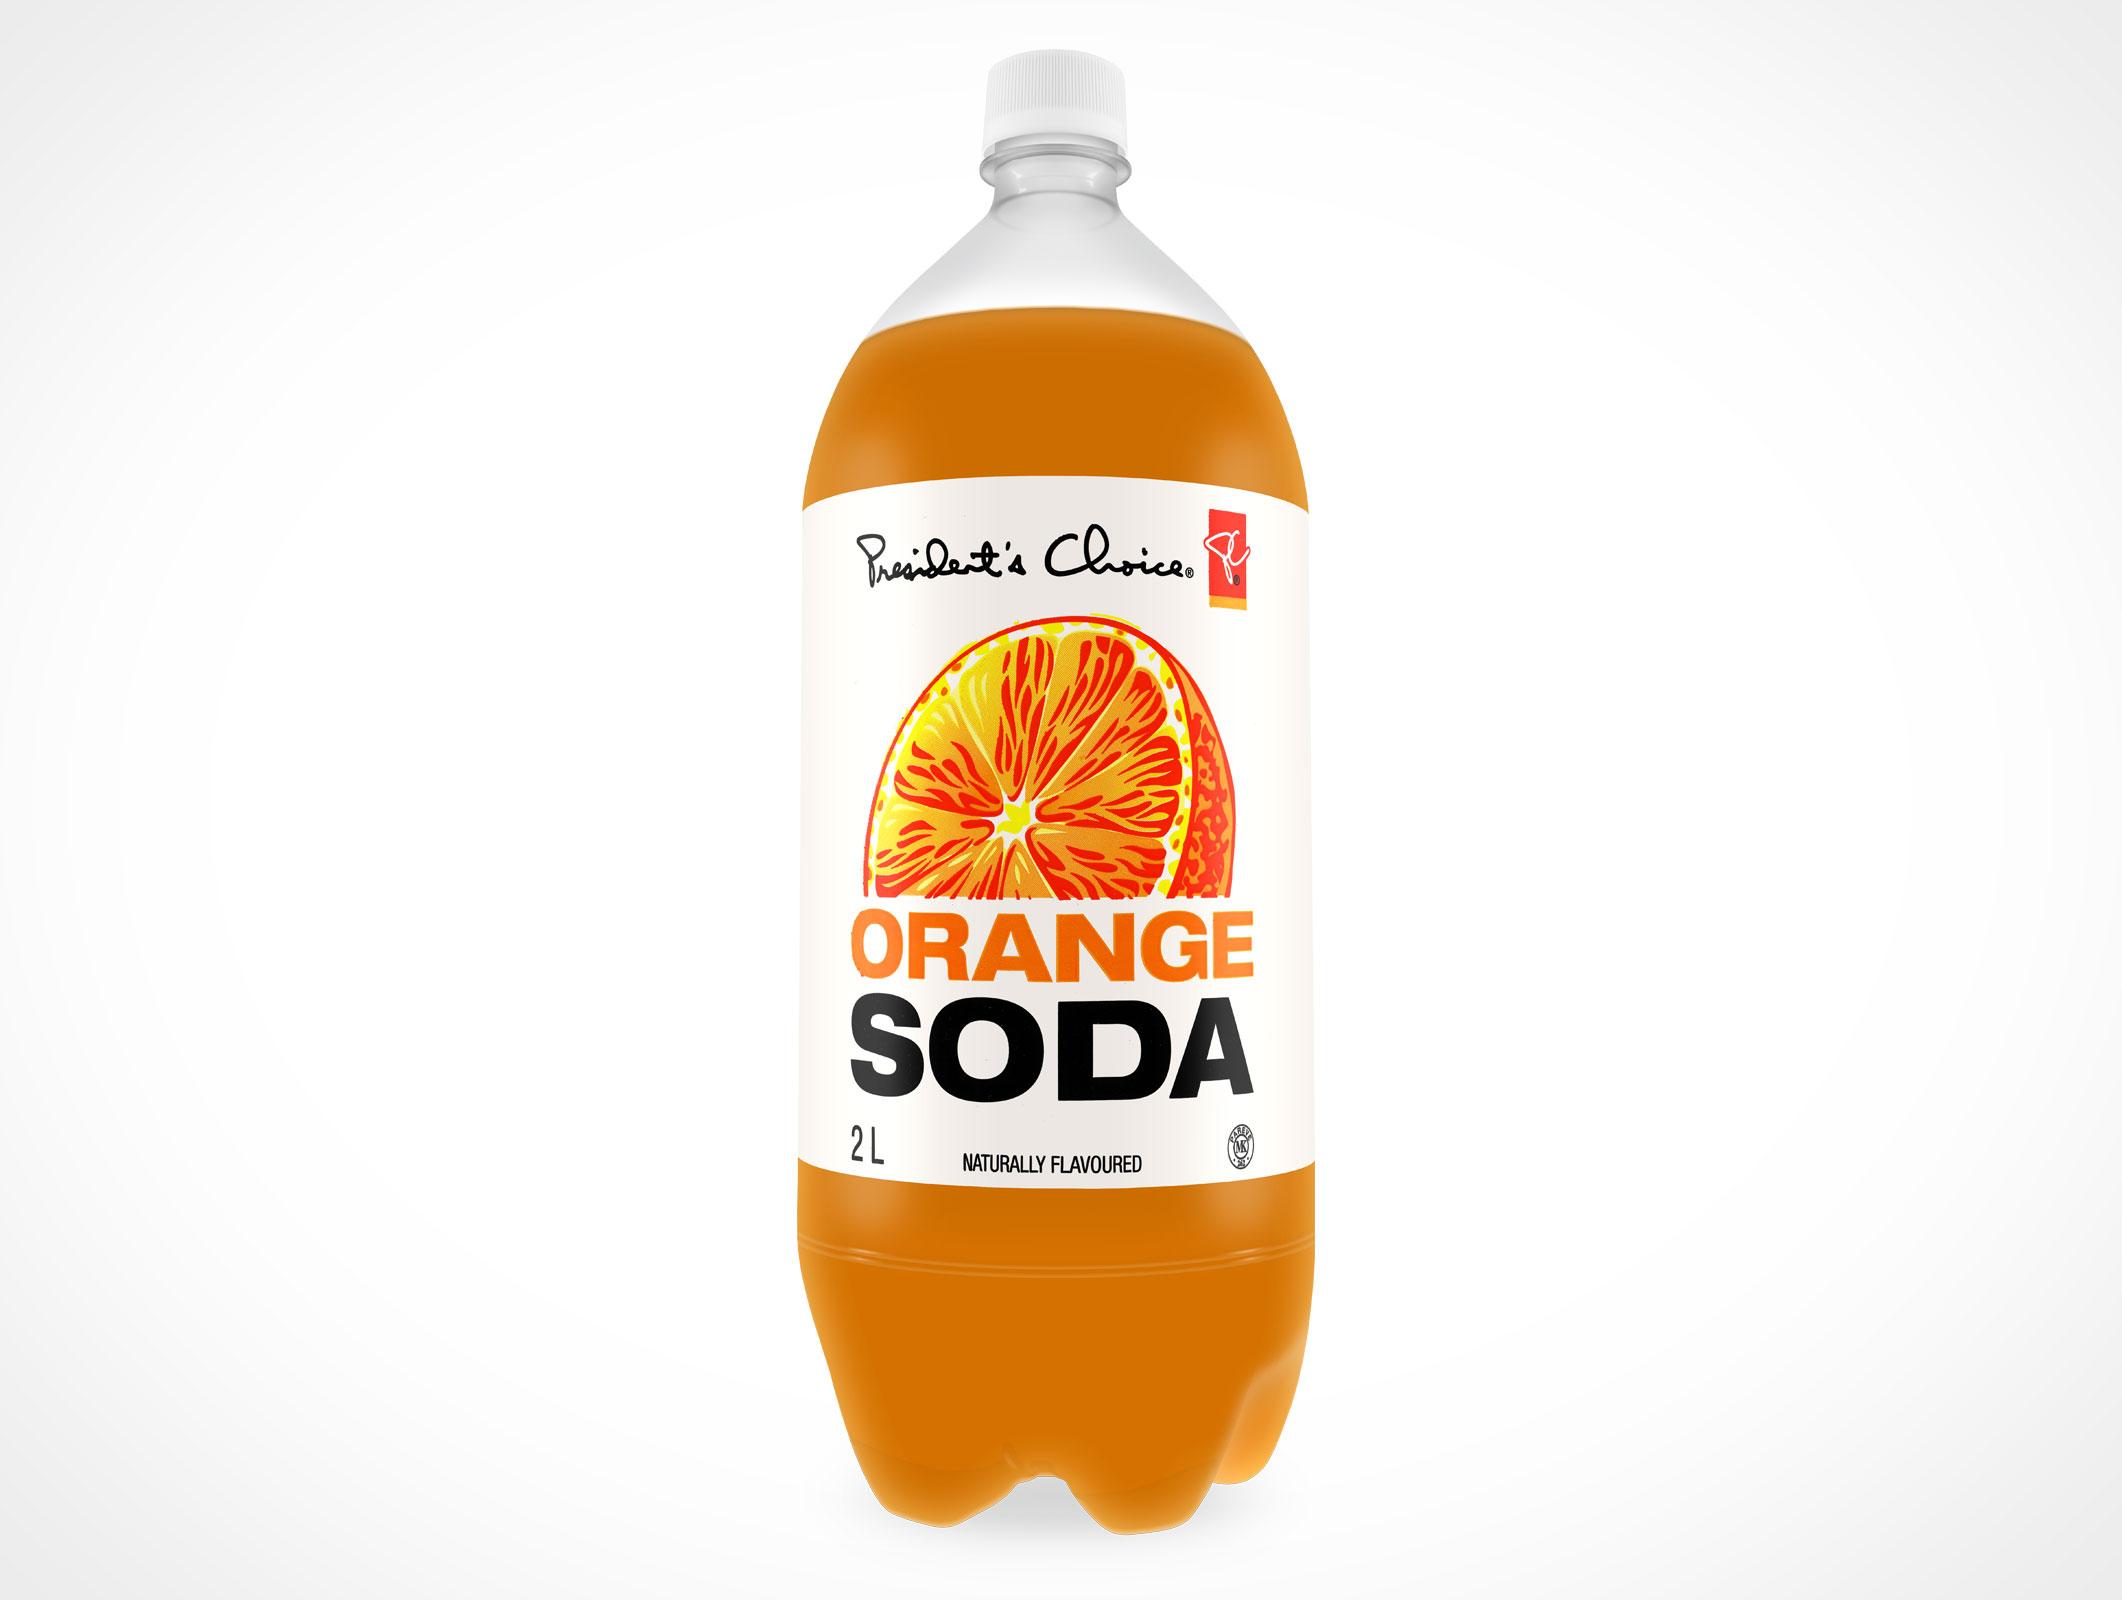 Soda Soft Drink Bottles